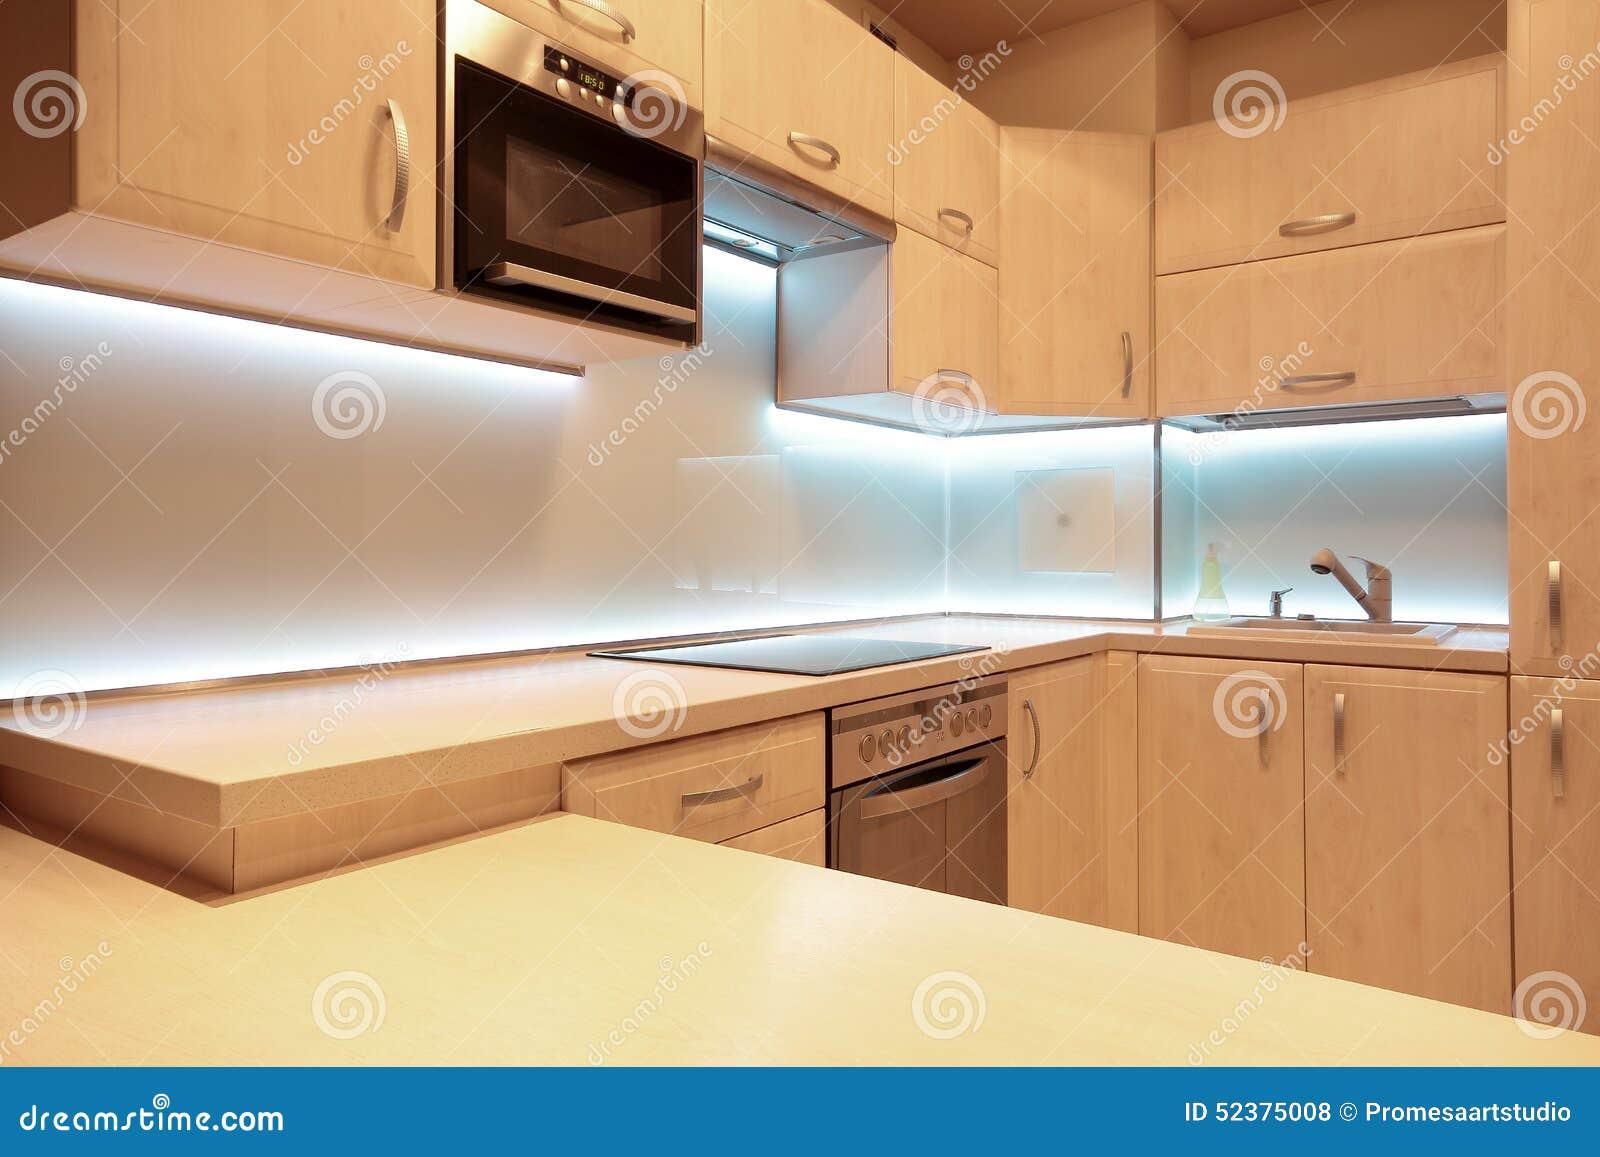 Modernt lyxigt kök med vit ledde belysning arkivfoto   bild: 46195106